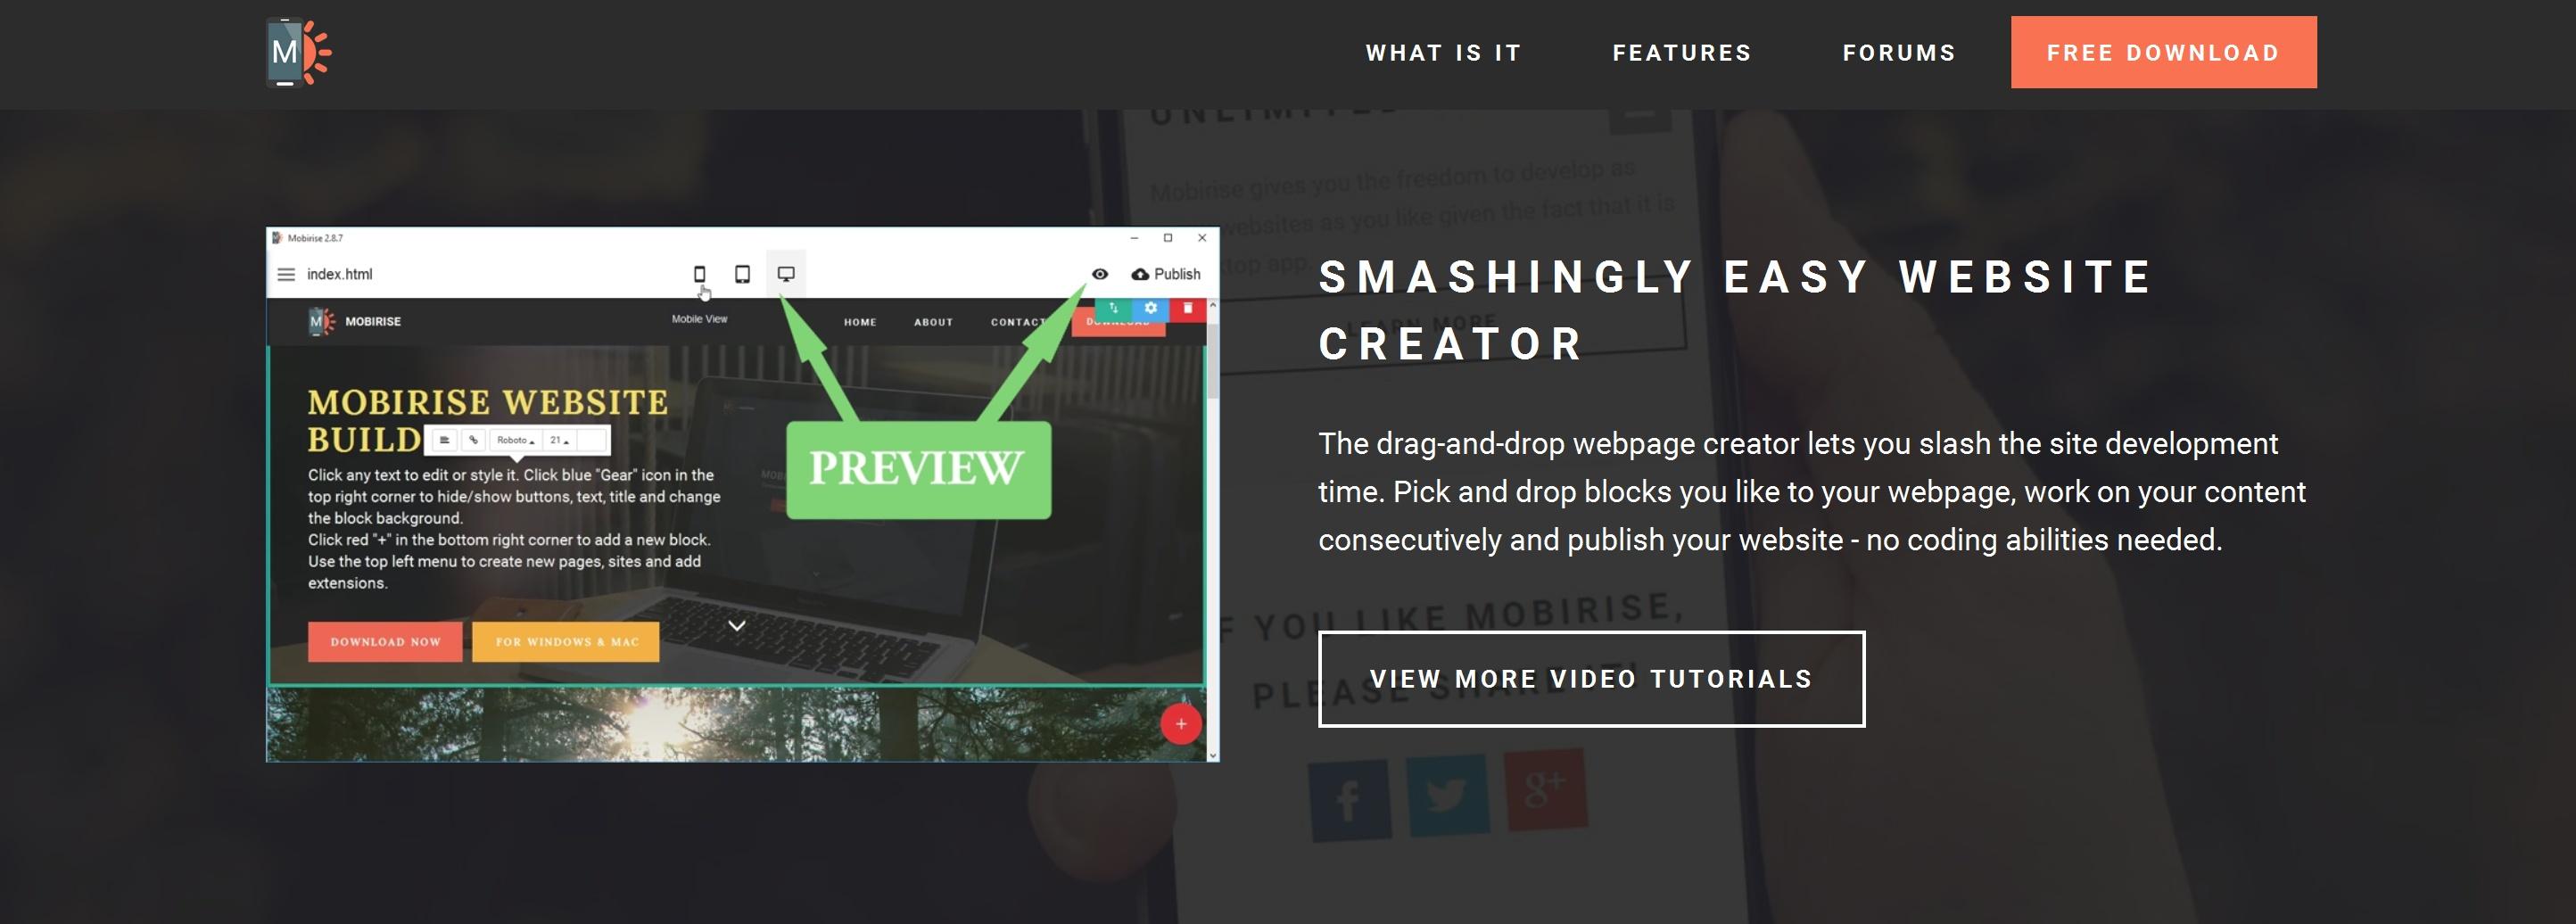 Best Simple Website Creator